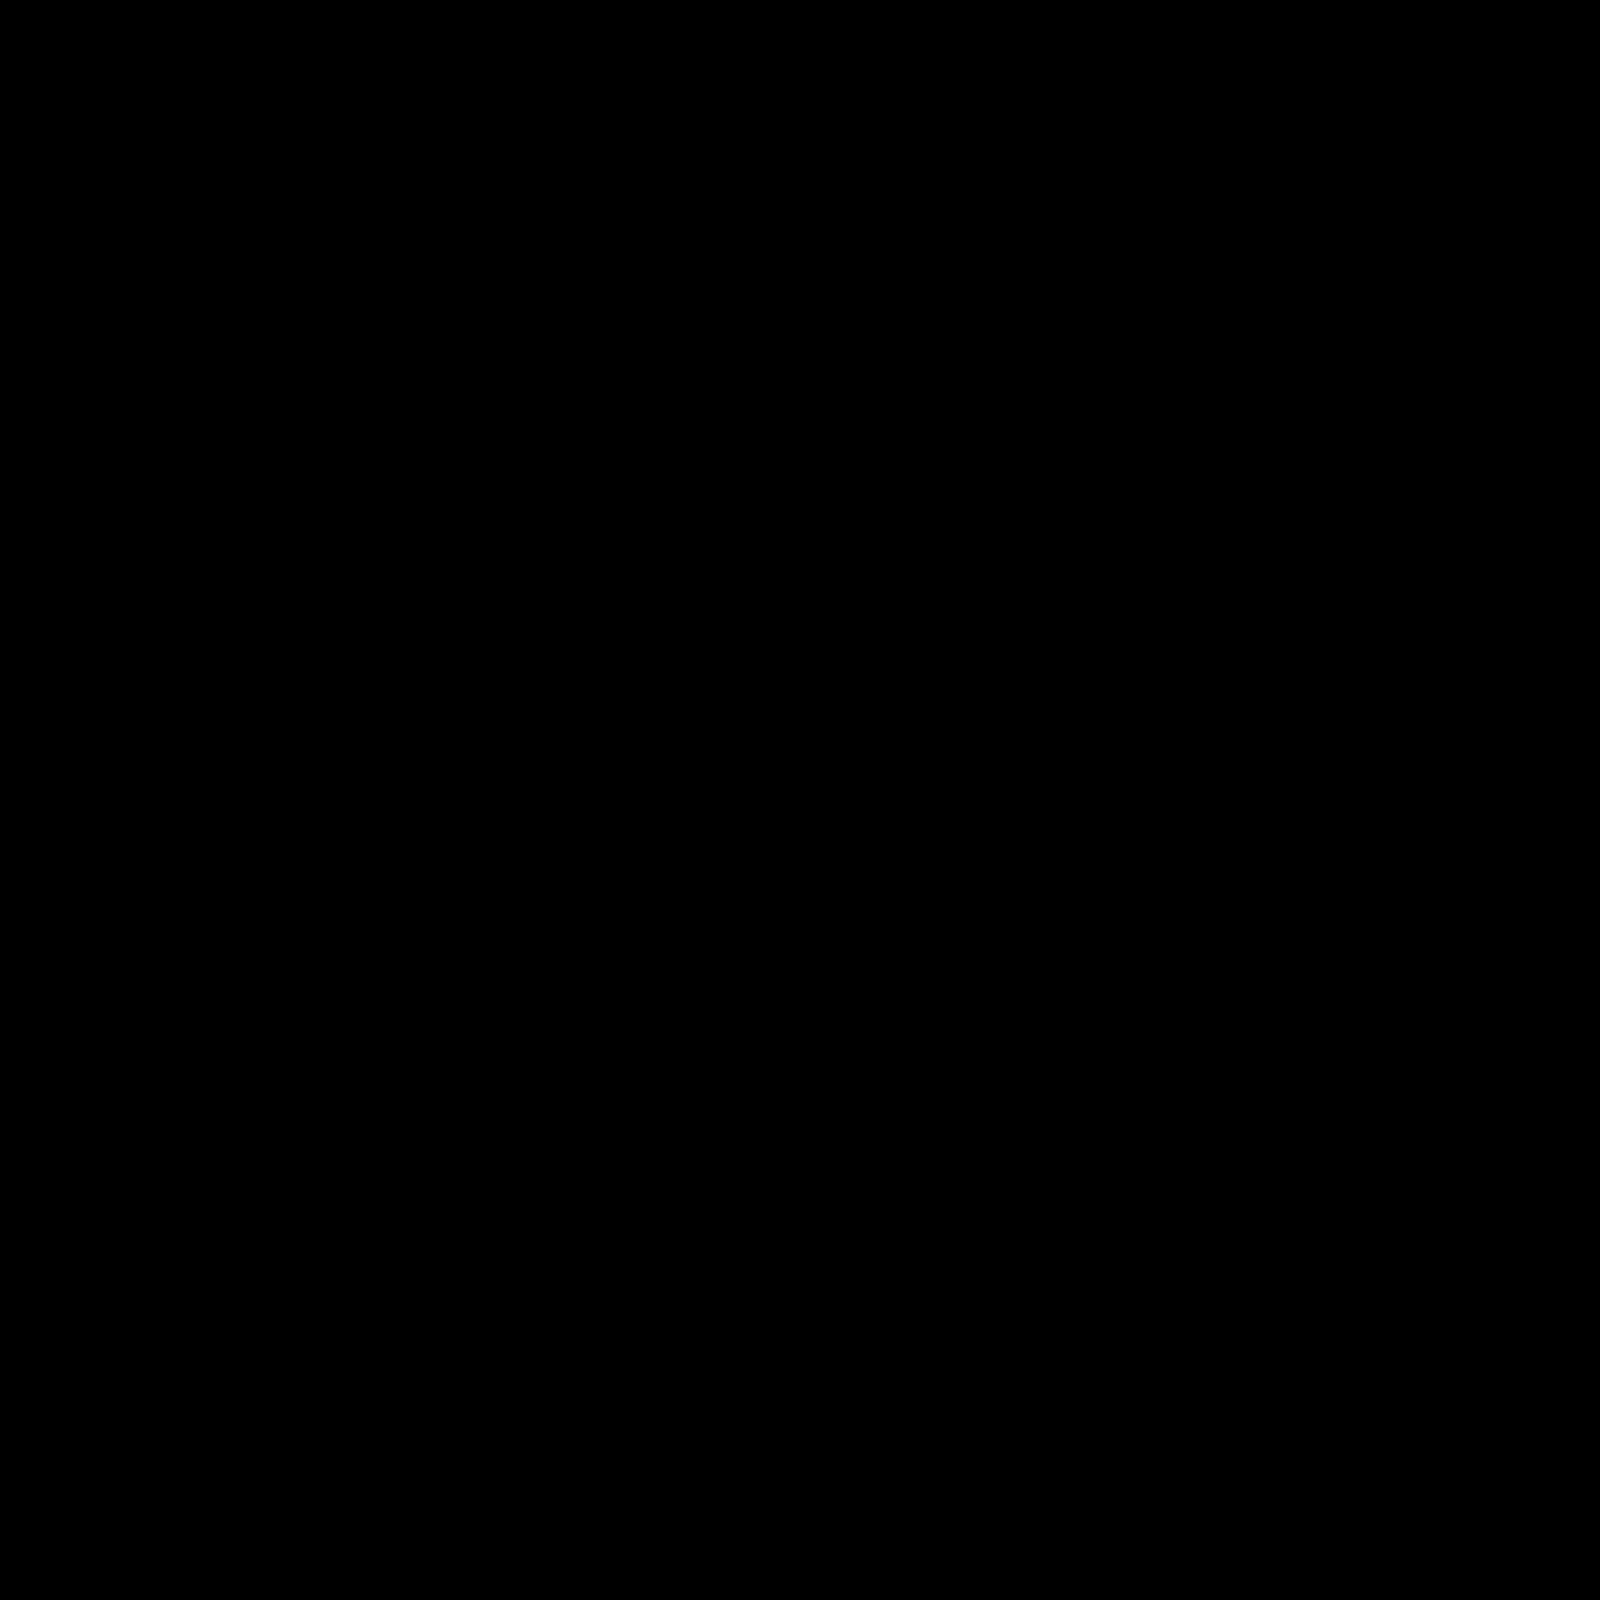 Router de wifi icon